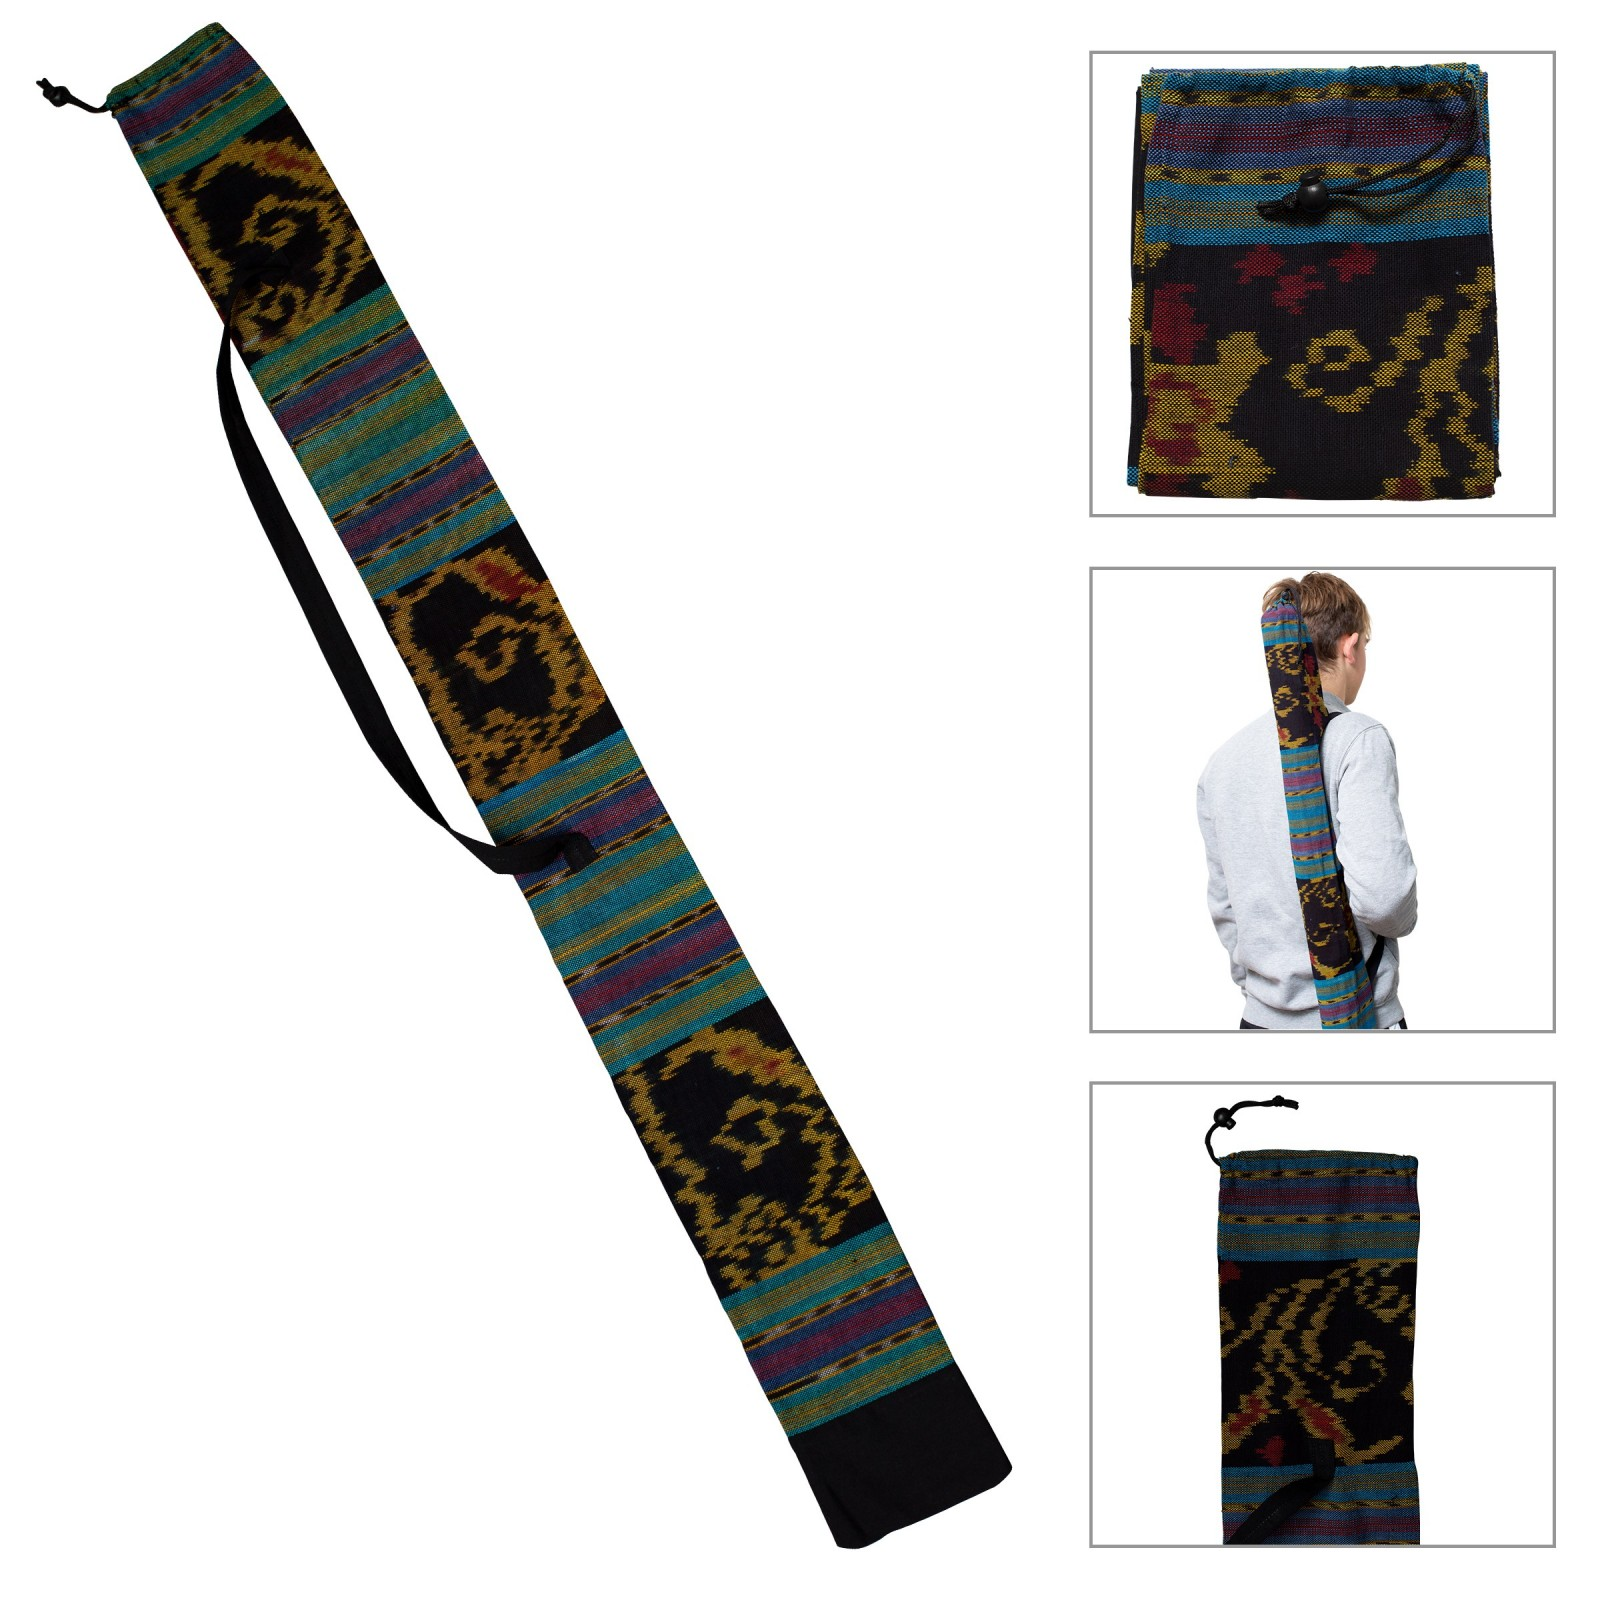 BOLSO DIDGERIDOO 125 cm - Bolso Didgeridoo de tela Ikat. Diámetro Ø 8 cm. Incluyendo correa de transporte